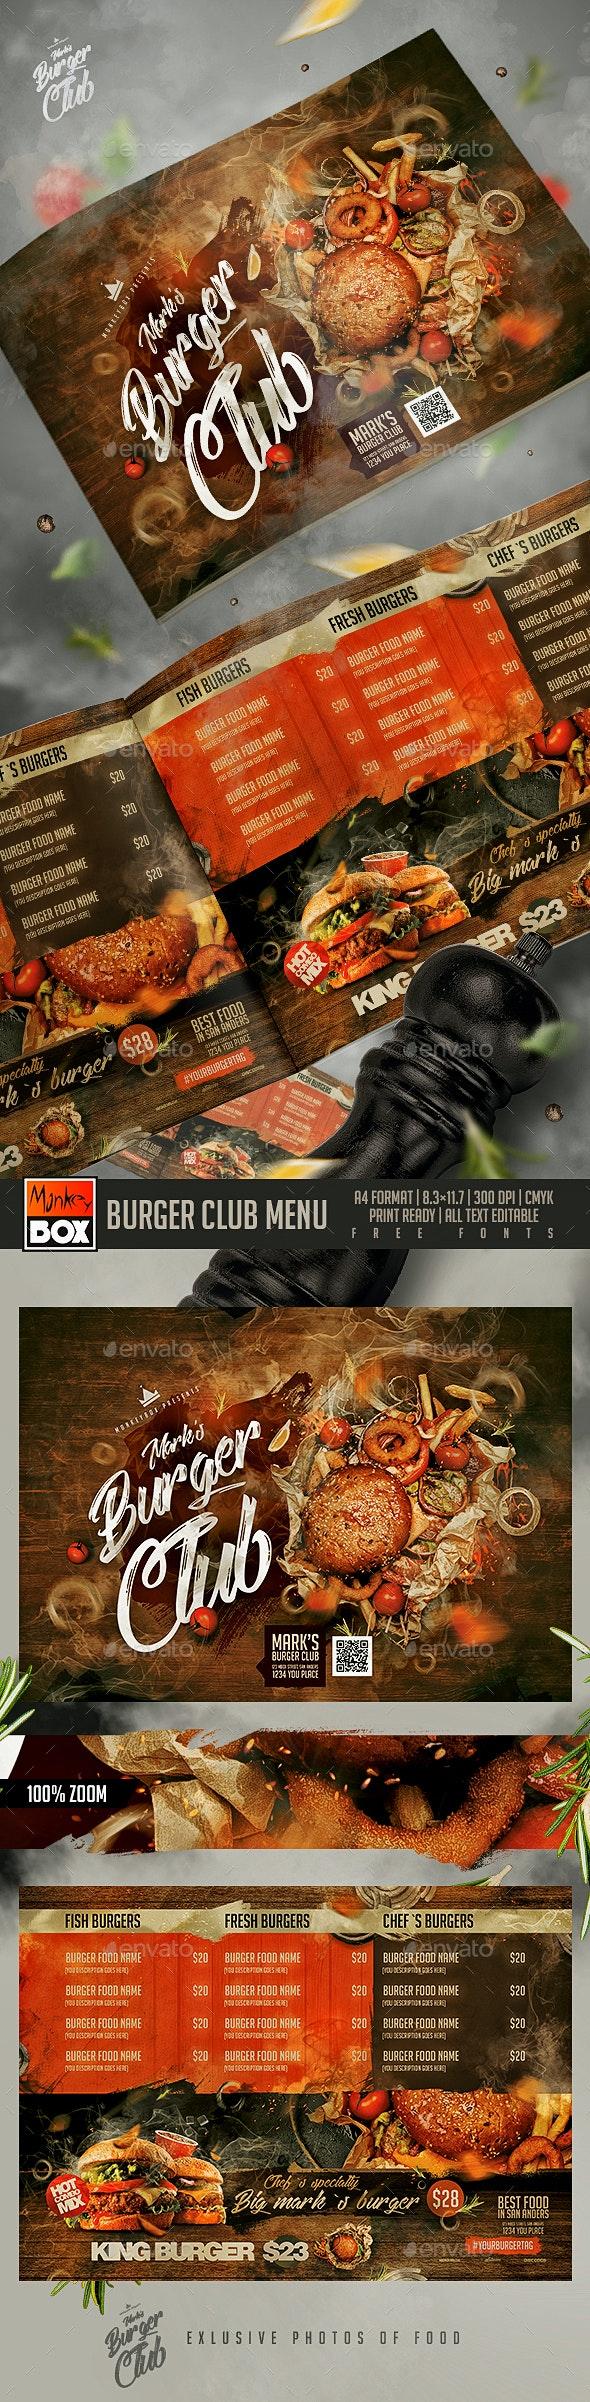 Burger Club Menu - Food Menus Print Templates